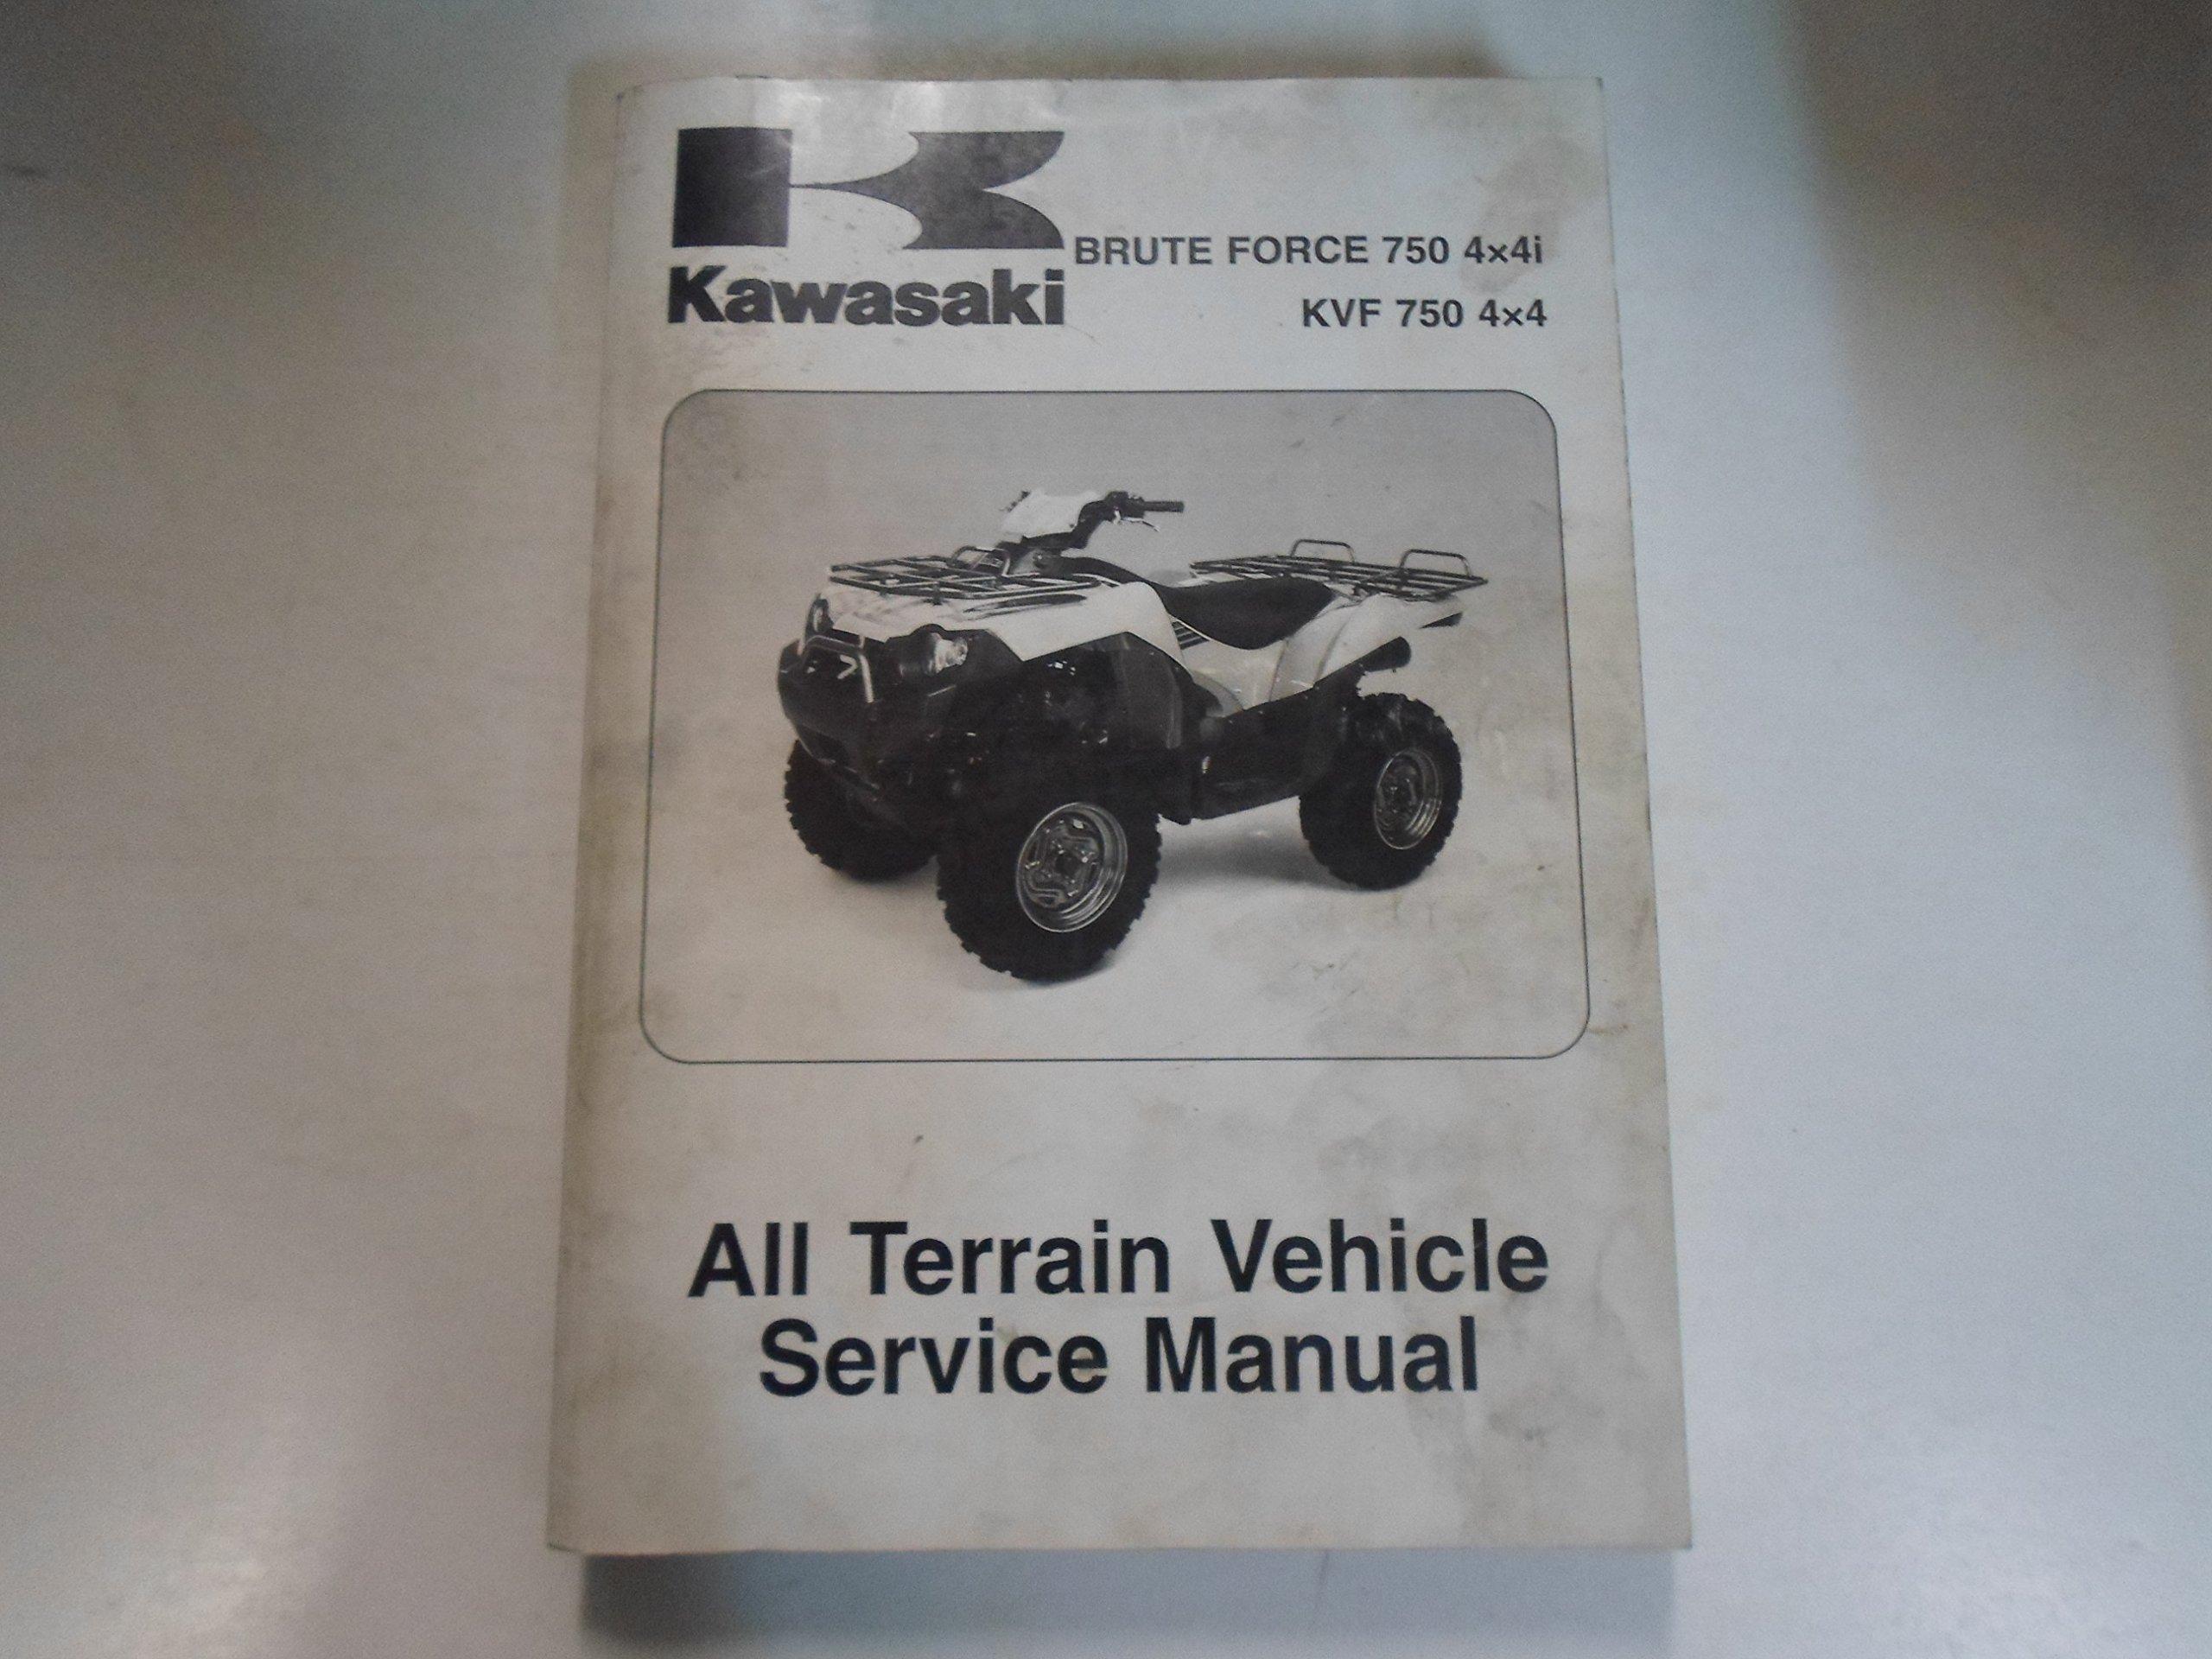 2005 2007 Kawasaki Brute Force 750 4x4i KVF 750 4x4 Service Manual OEM:  KAWASAKI: Amazon.com: Books